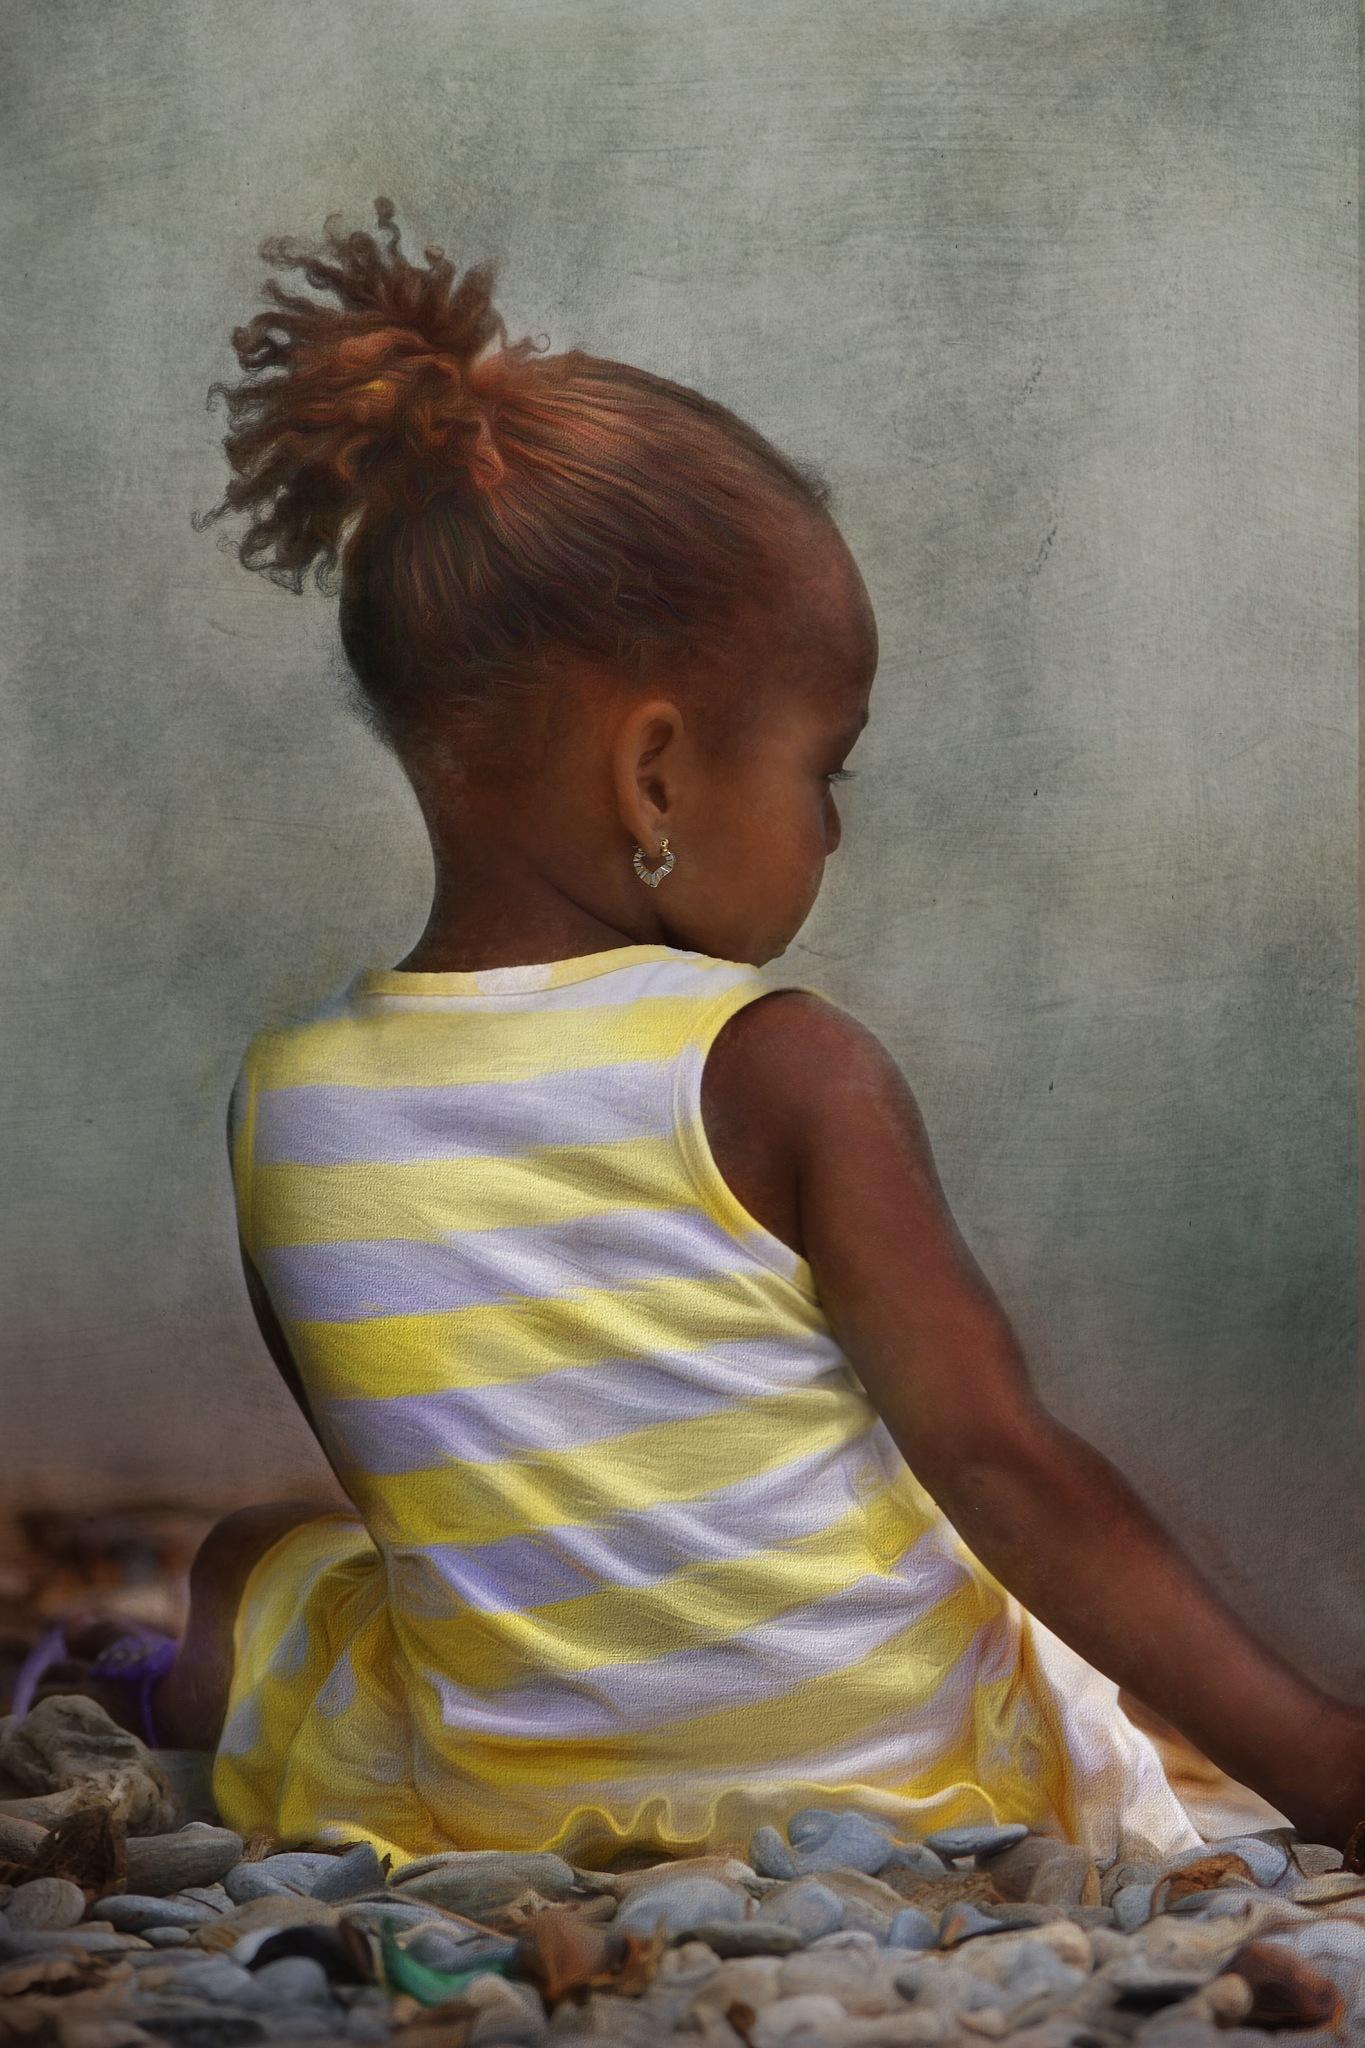 Lilltle dominican girl by sylviecorriveau